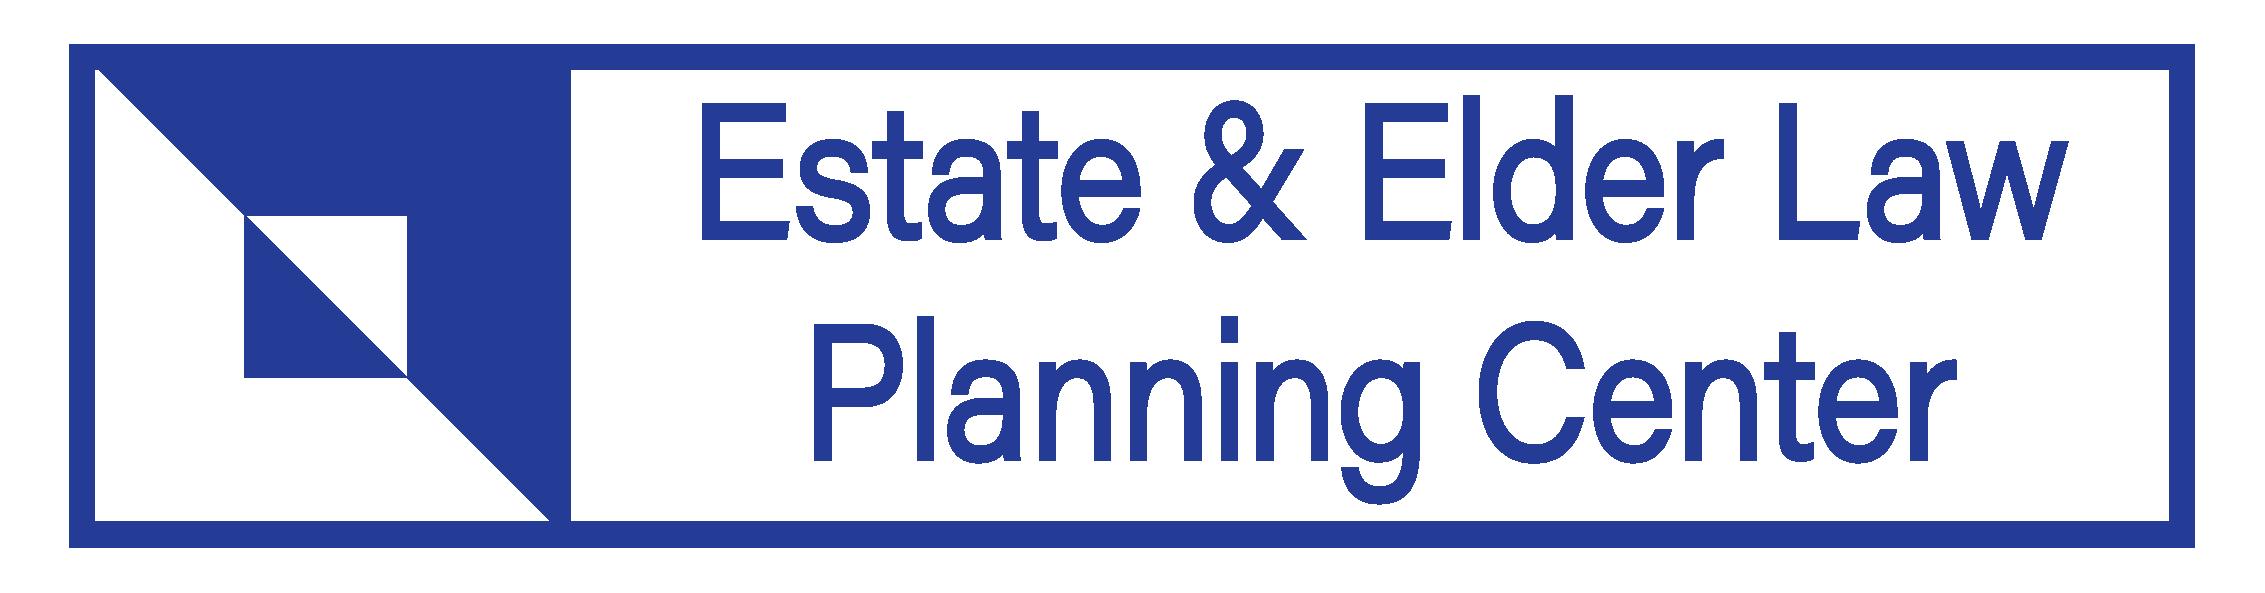 Estate & Elder Law Planning Center